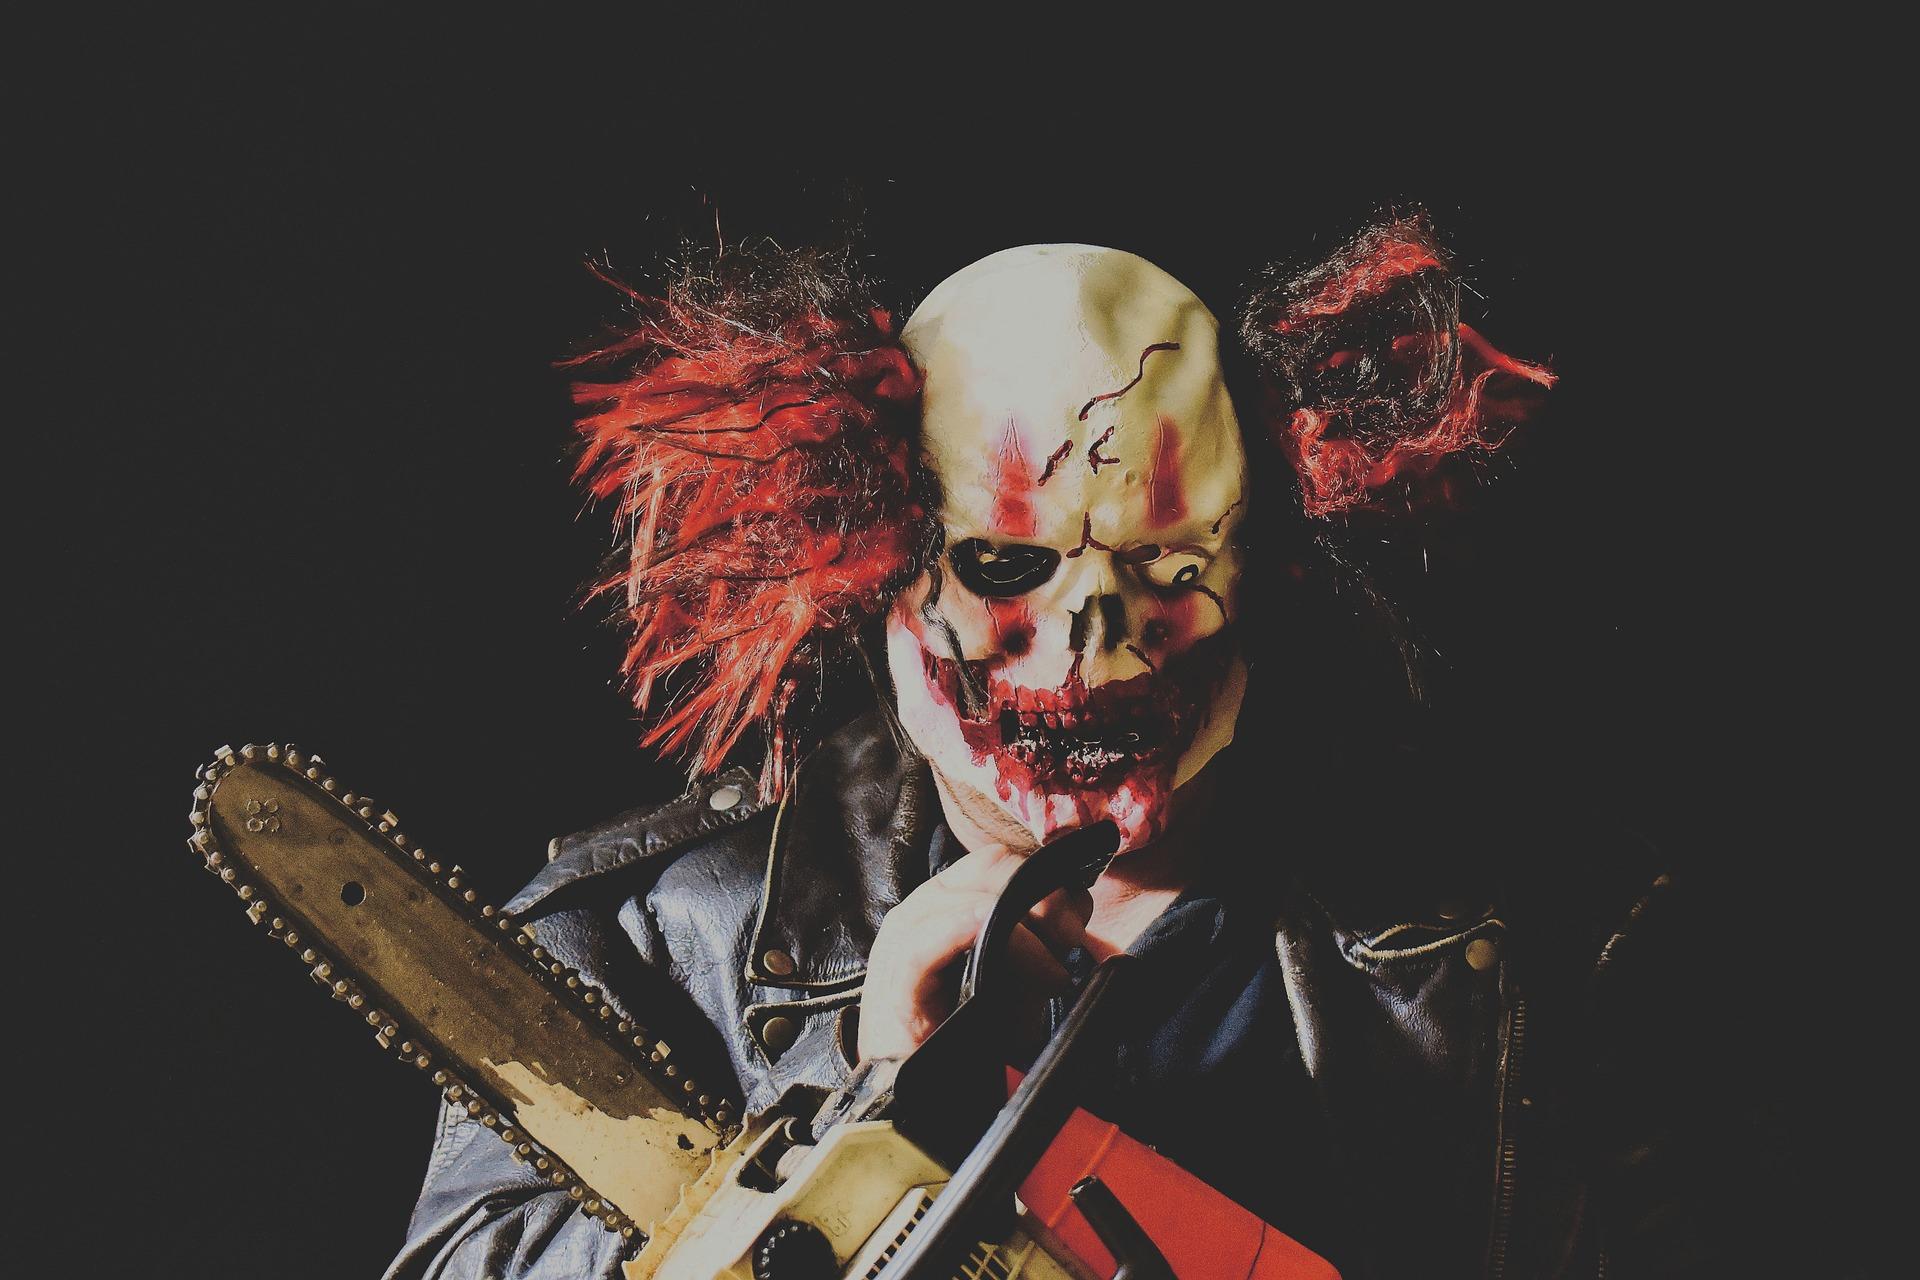 horror-clown-3593409_1920.jpg